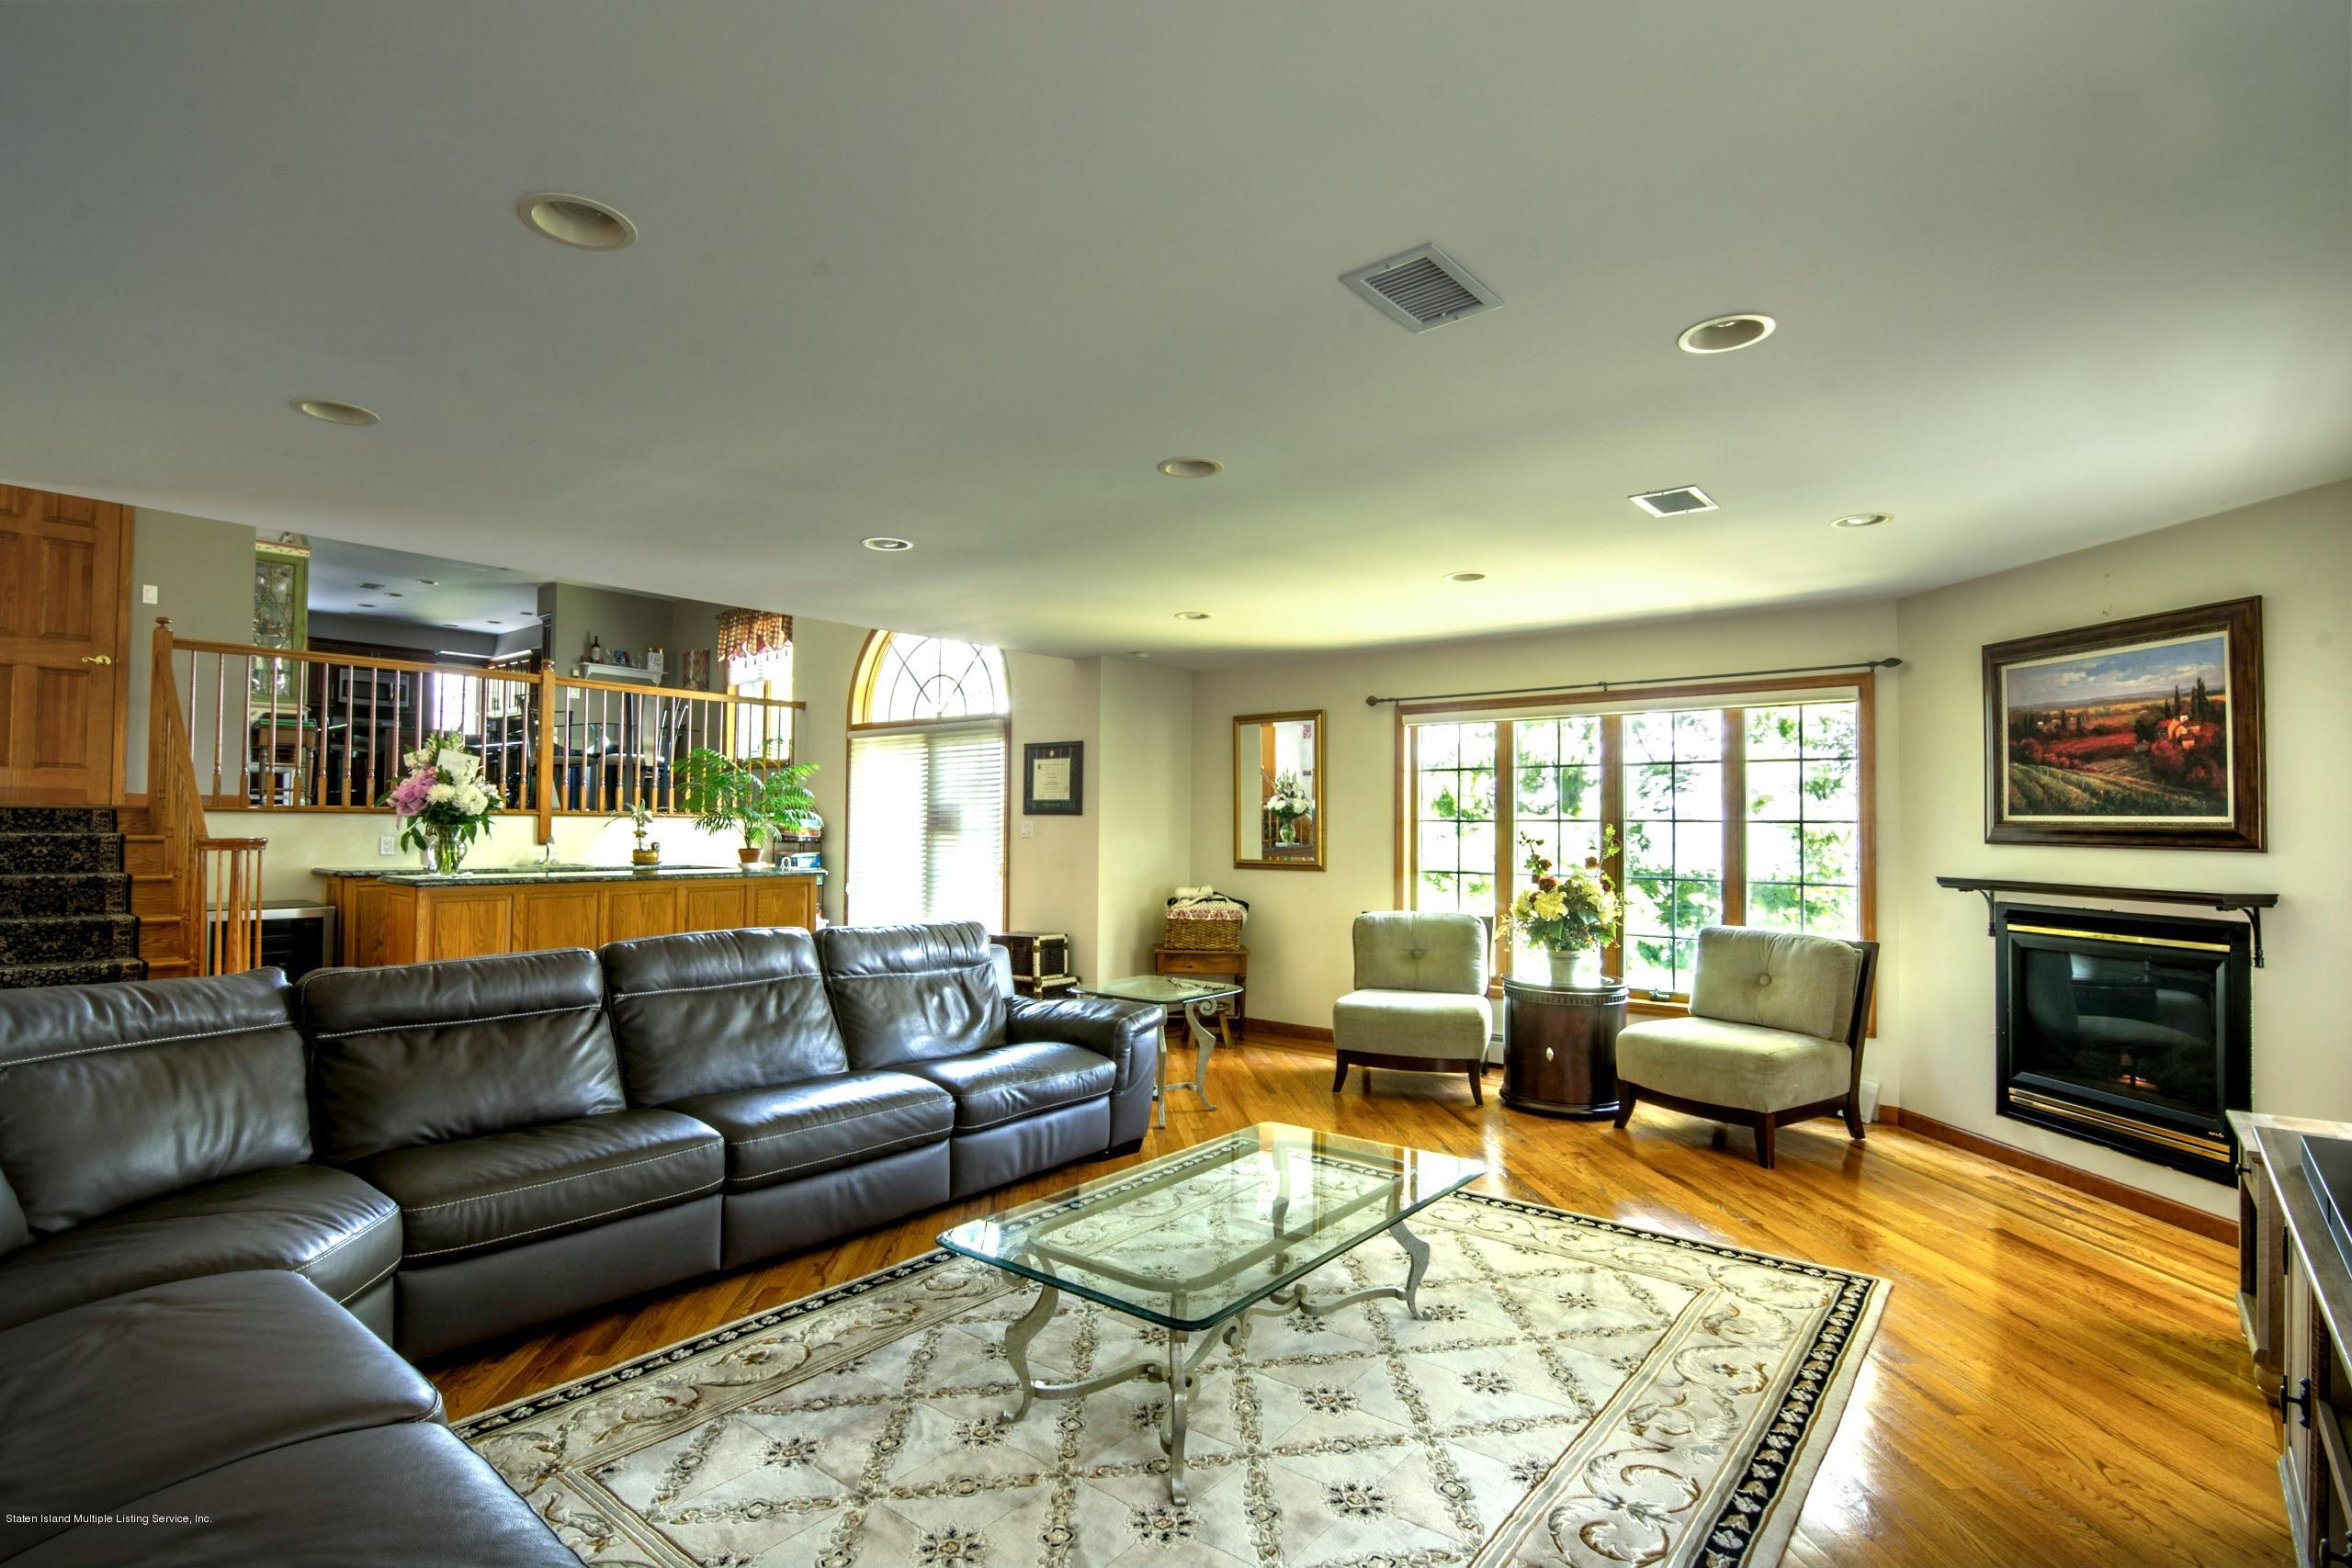 Single Family - Detached 120 Milden Avenue  Staten Island, NY 10301, MLS-1121068-4